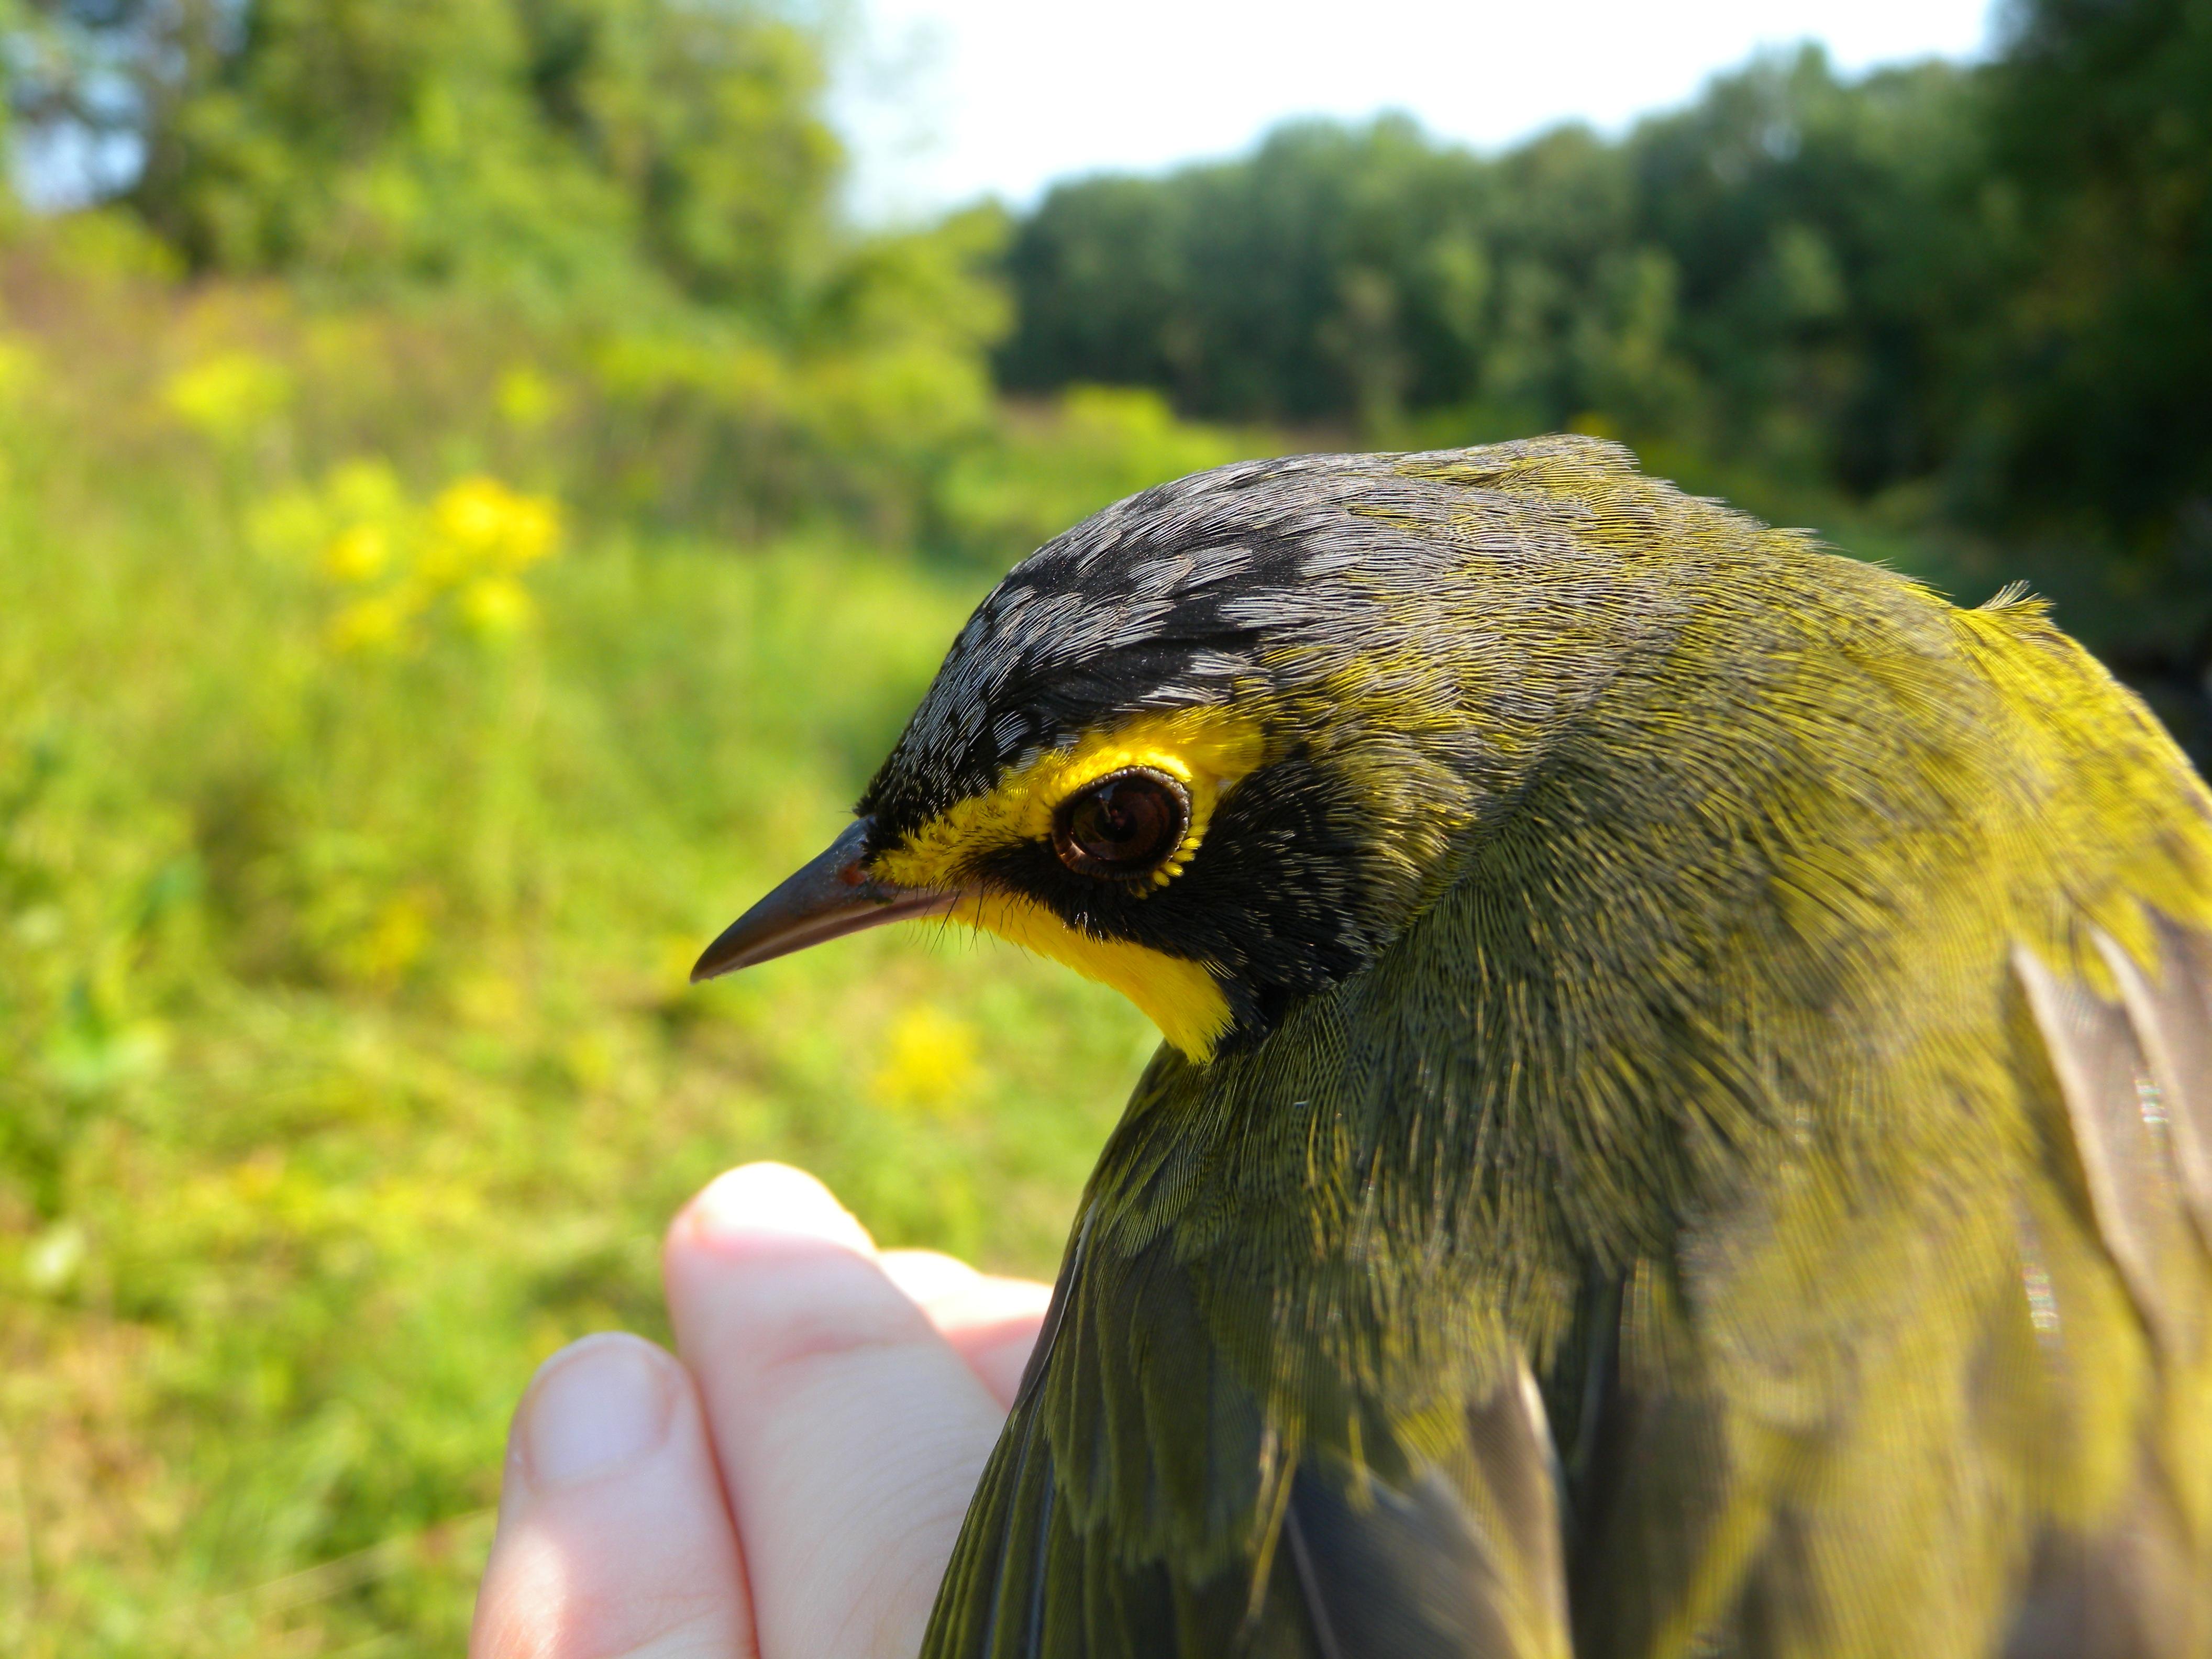 Male Kentucky Warbler close-up.  Photo by Blake Goll.